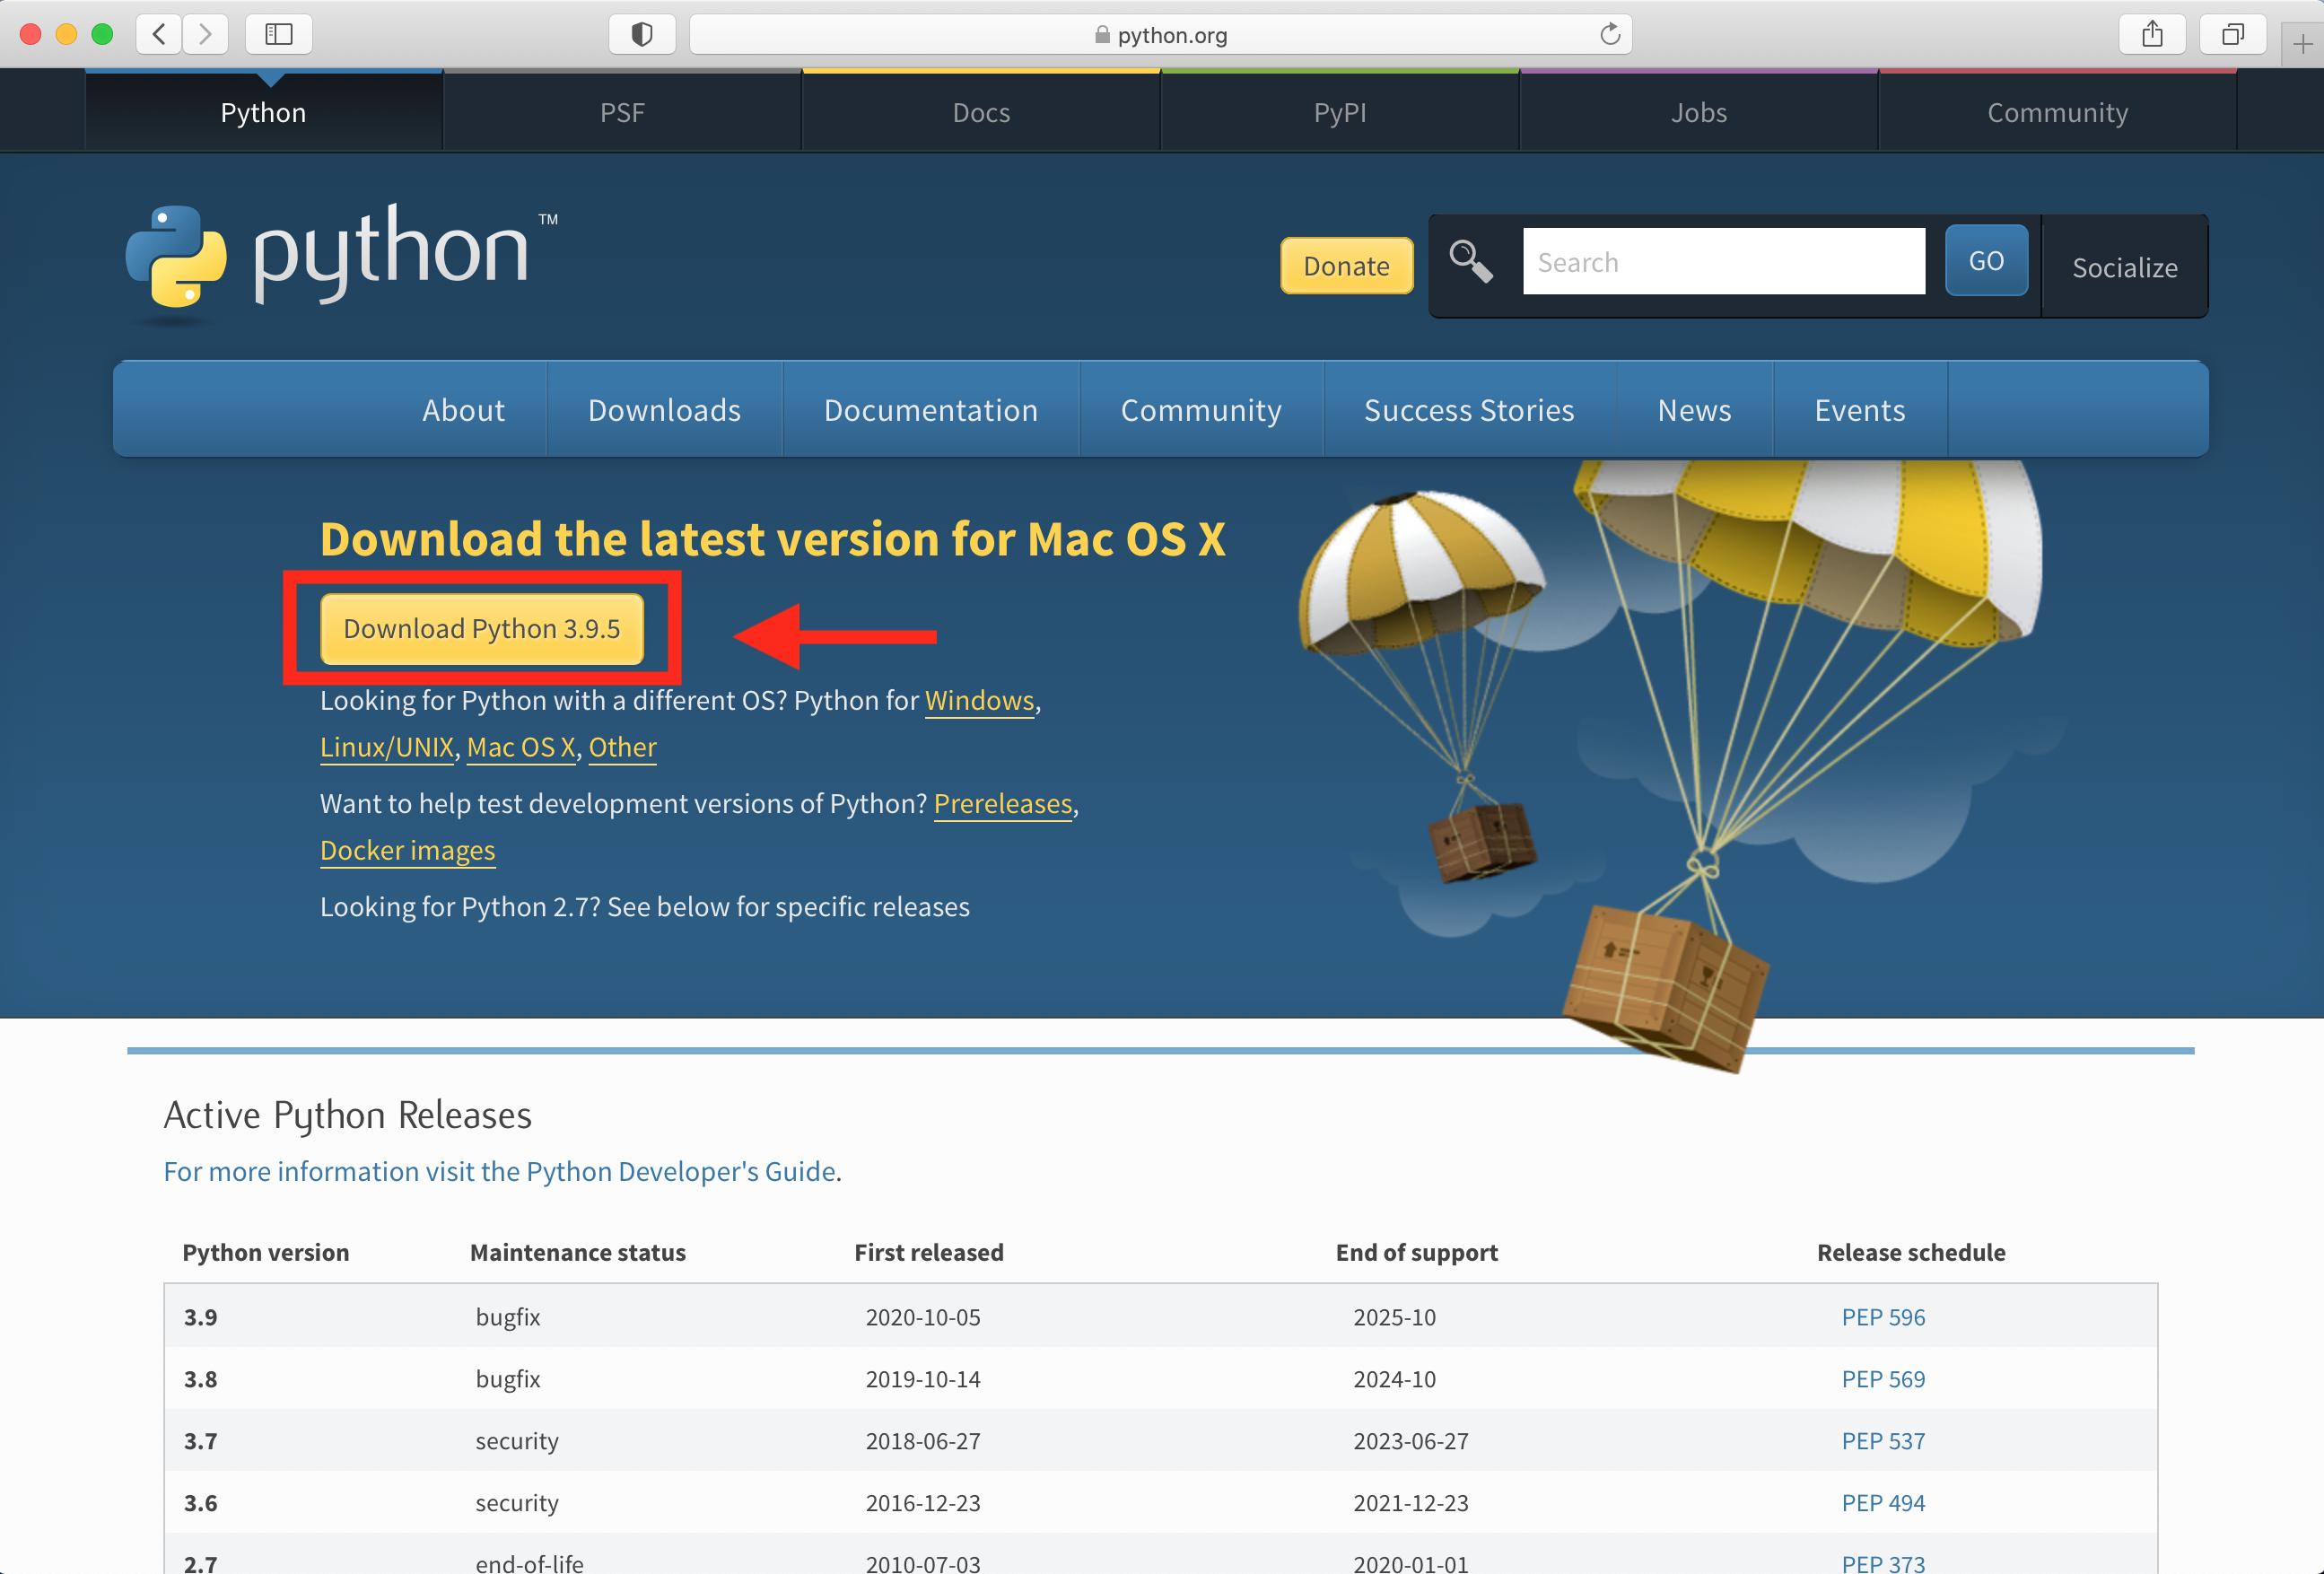 Python.org Website